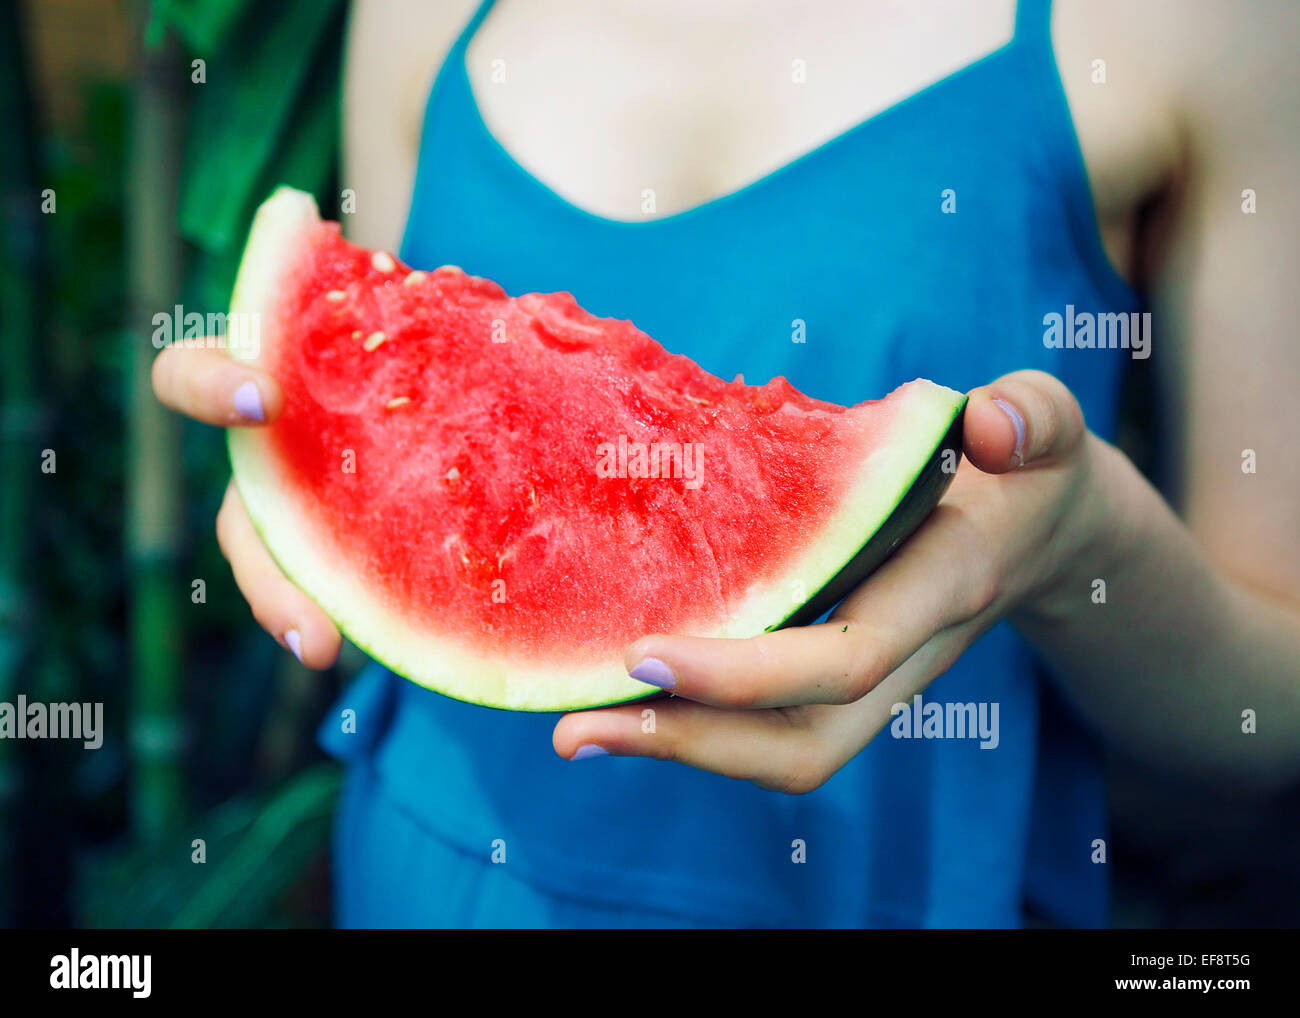 Frau Holding Scheibe Wassermelone Stockbild